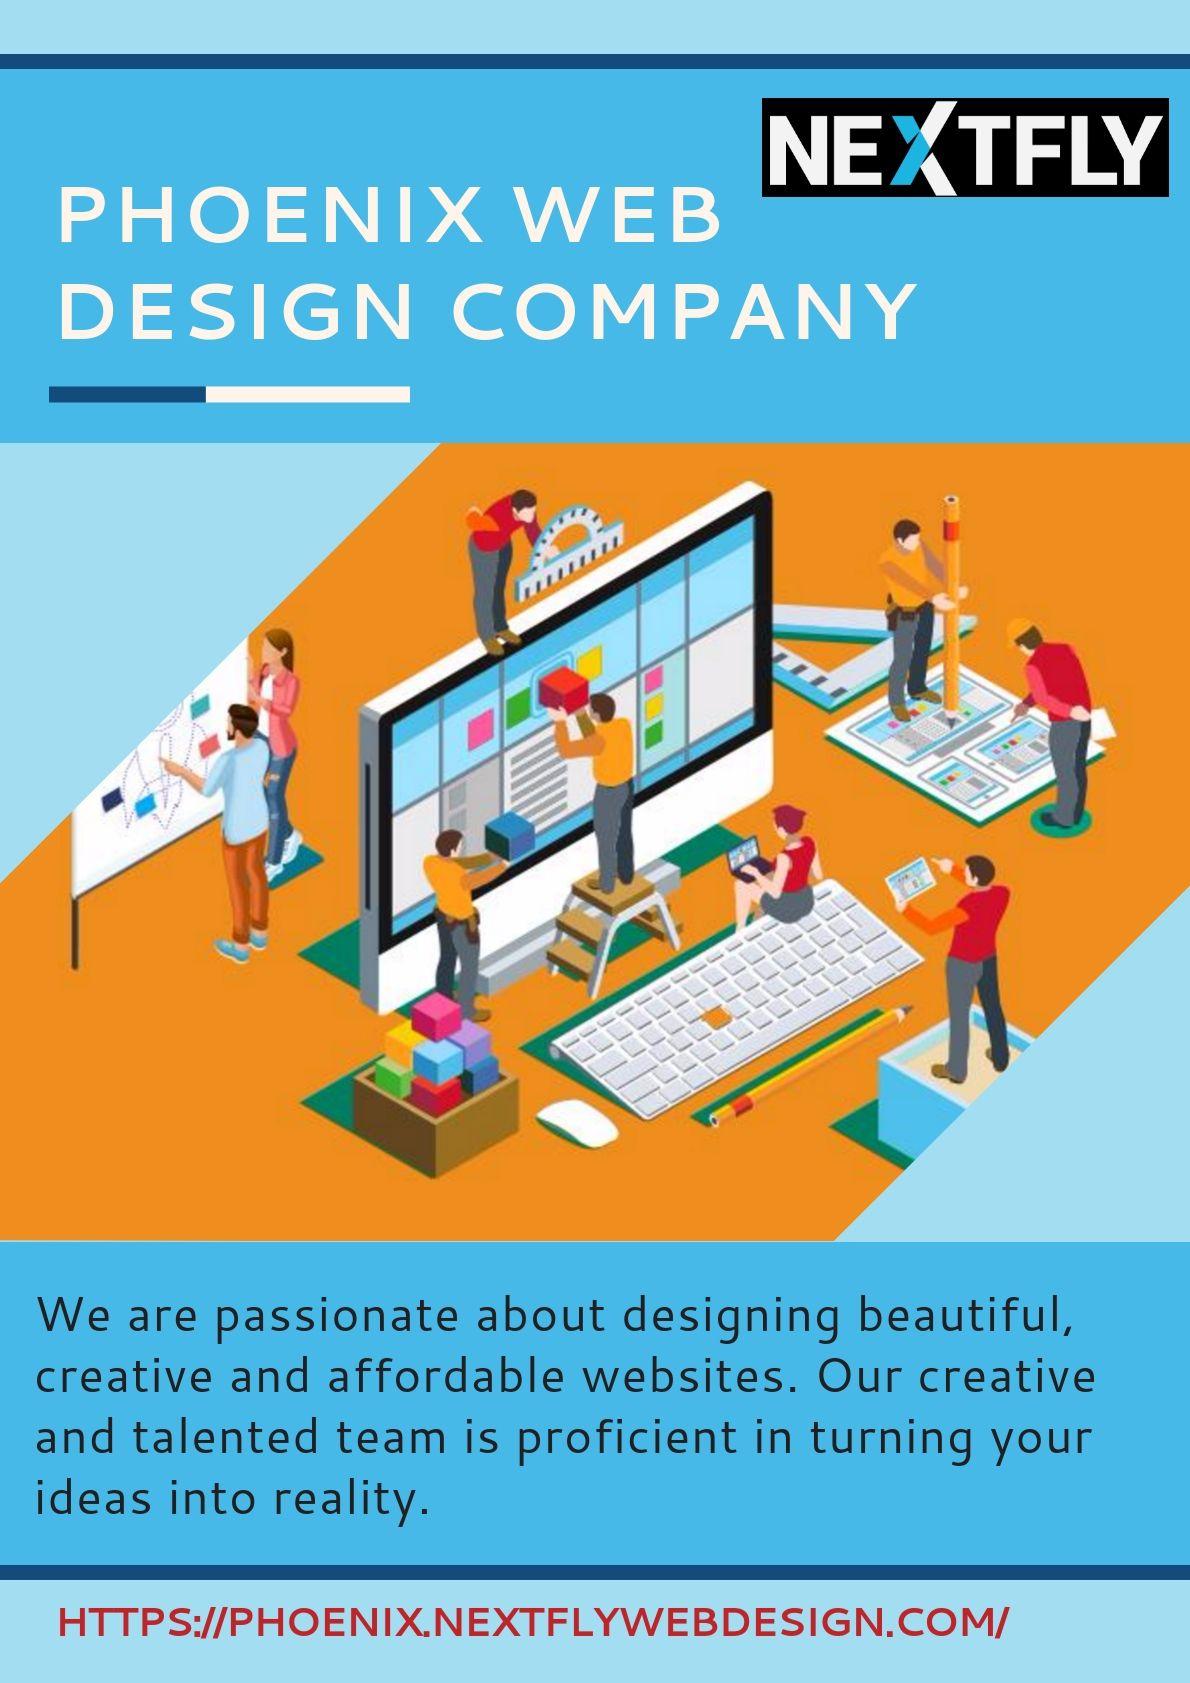 Phoenix Web Design Company Nextfly Is One Of The Premieres Phoenix Web Design Company That Provides World Cla Web Design Website Design Company Website Design